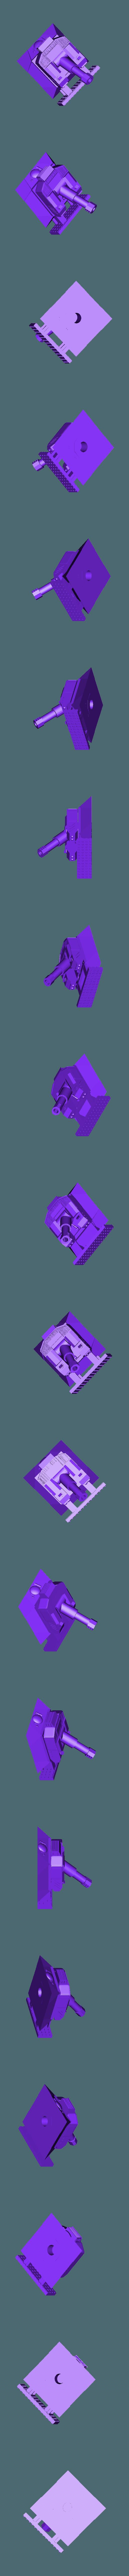 heavy_mortar_turret_complete.stl Download free STL file Heavy Mortar turret for 28mm wargames. Warhammer, warpath ect • 3D print object, redstarkits